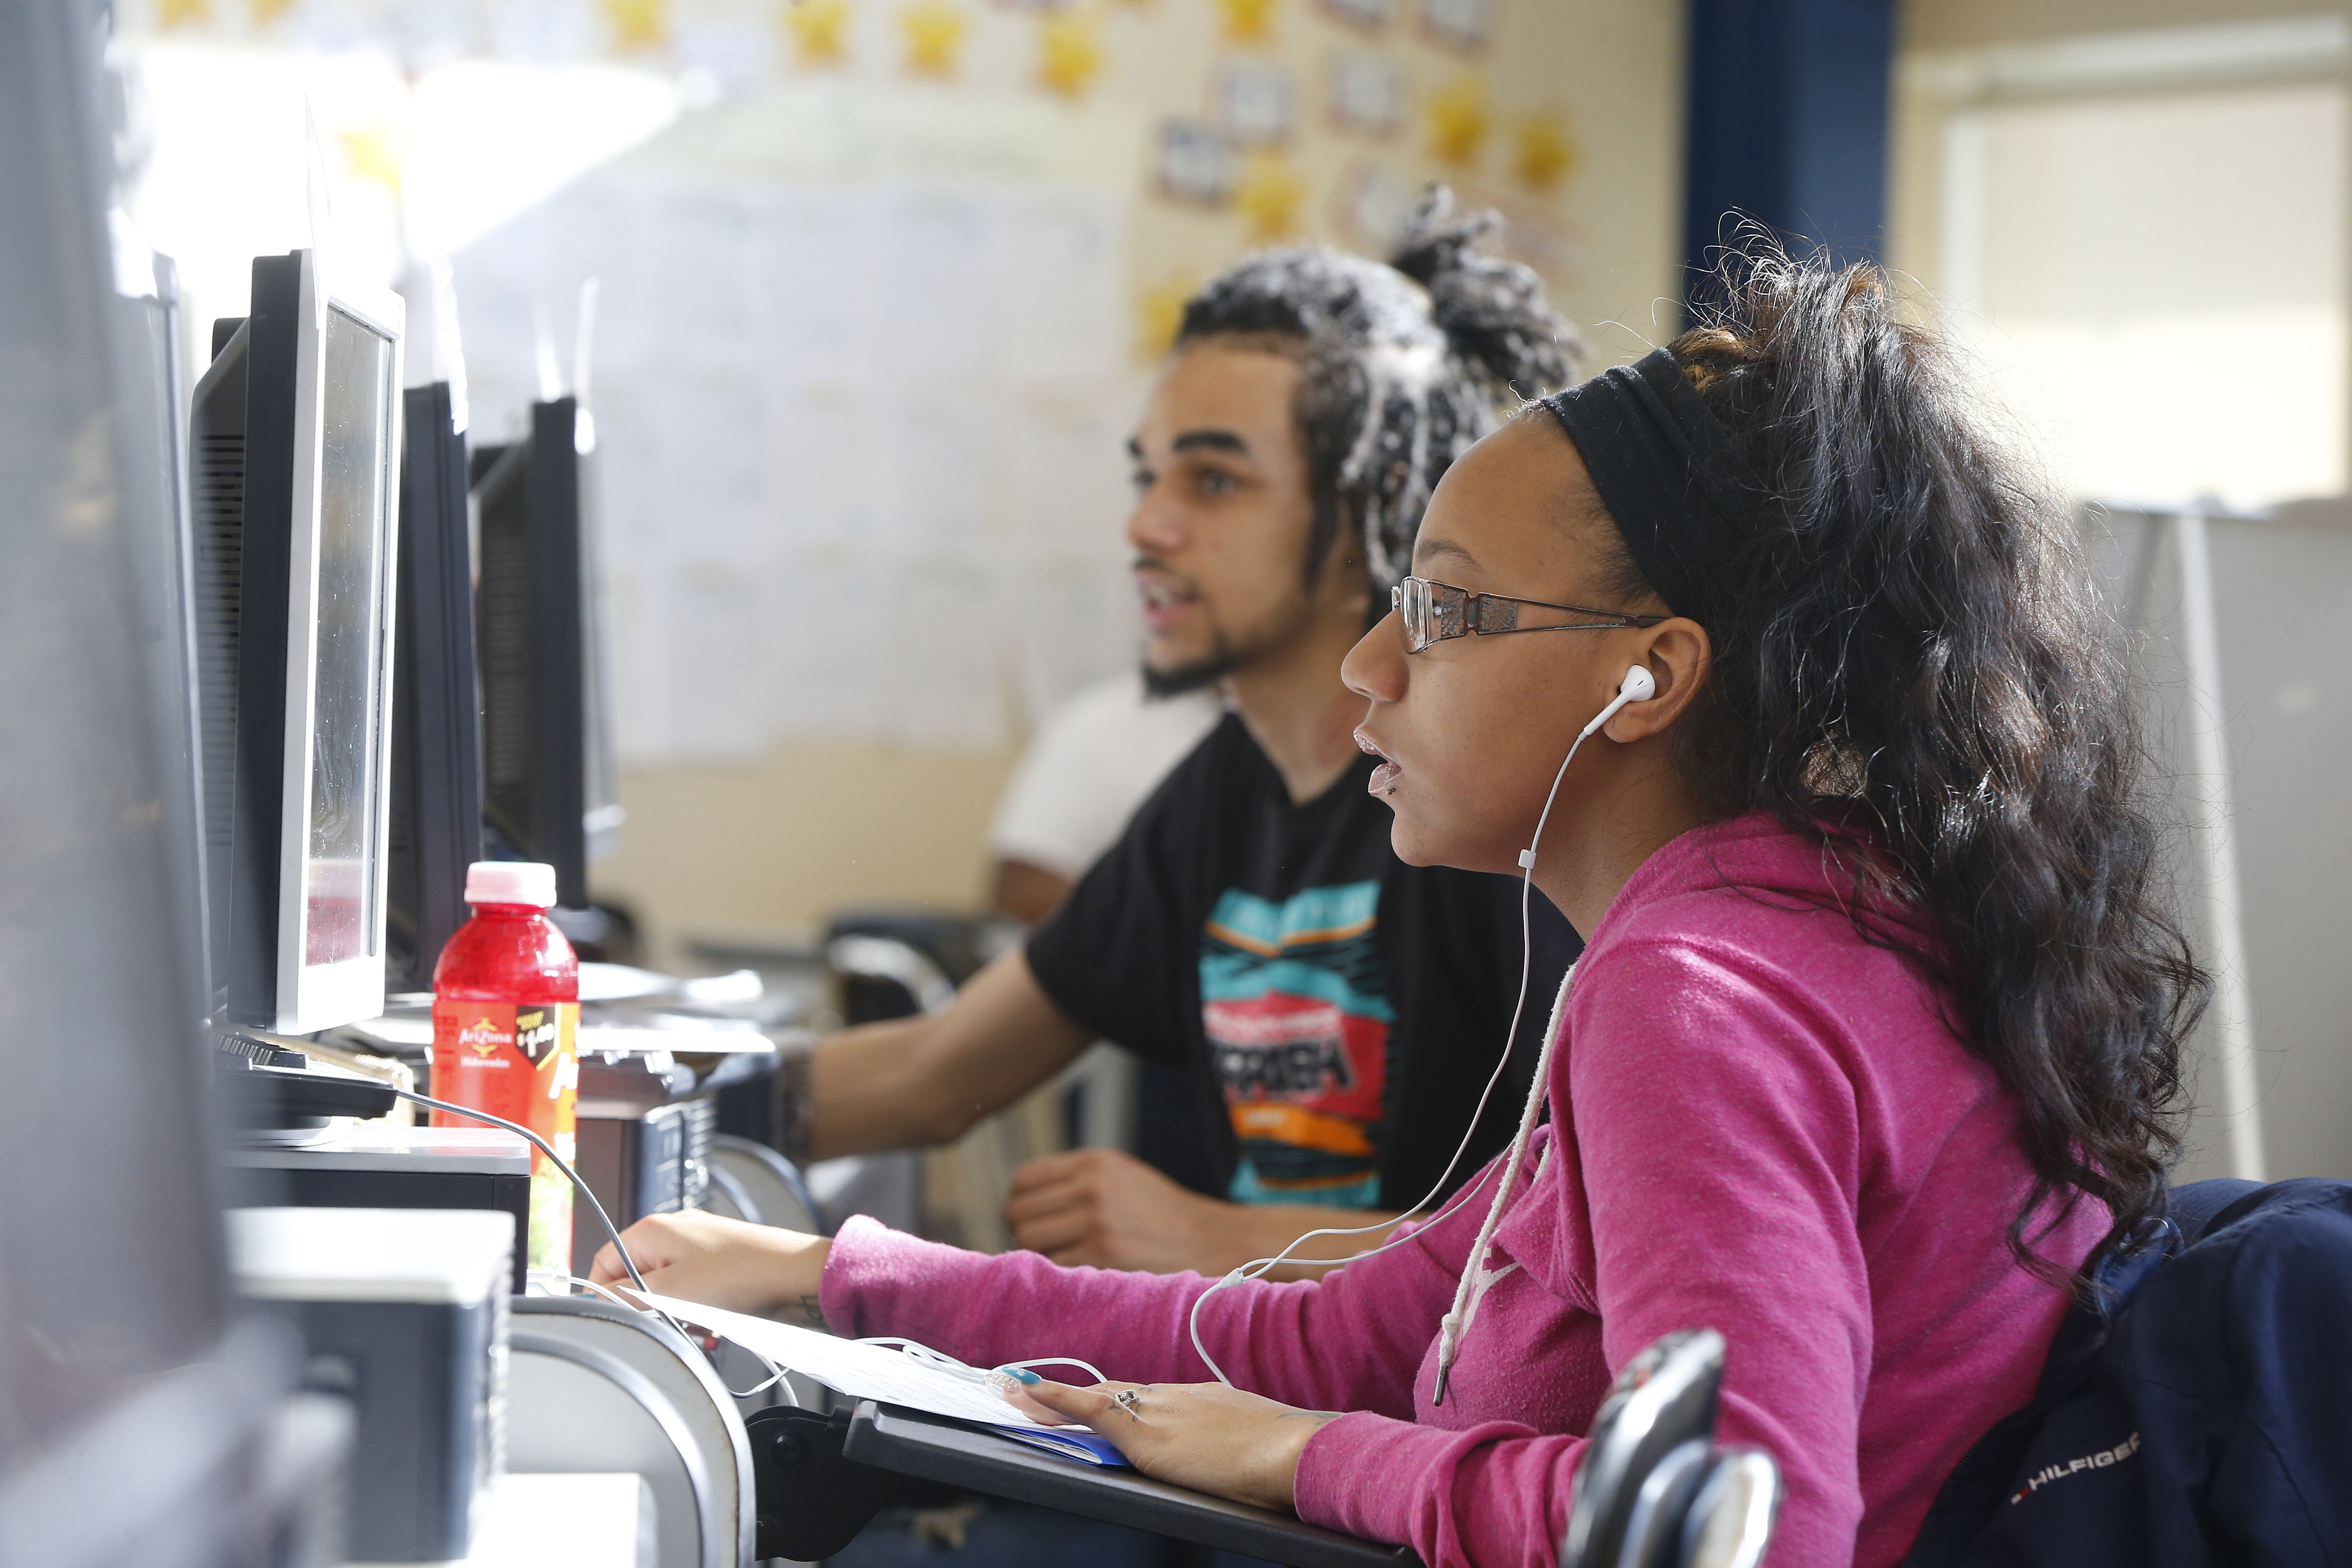 Jasmine Szymanski, front, and Andrew Guida, back, work on school work in the Buffalo Public School's 'virtual pathway' program at Burgard High School in Buffalo on Wednesday, Feb. 1, 2017. (Mark Mulville/Buffalo News)